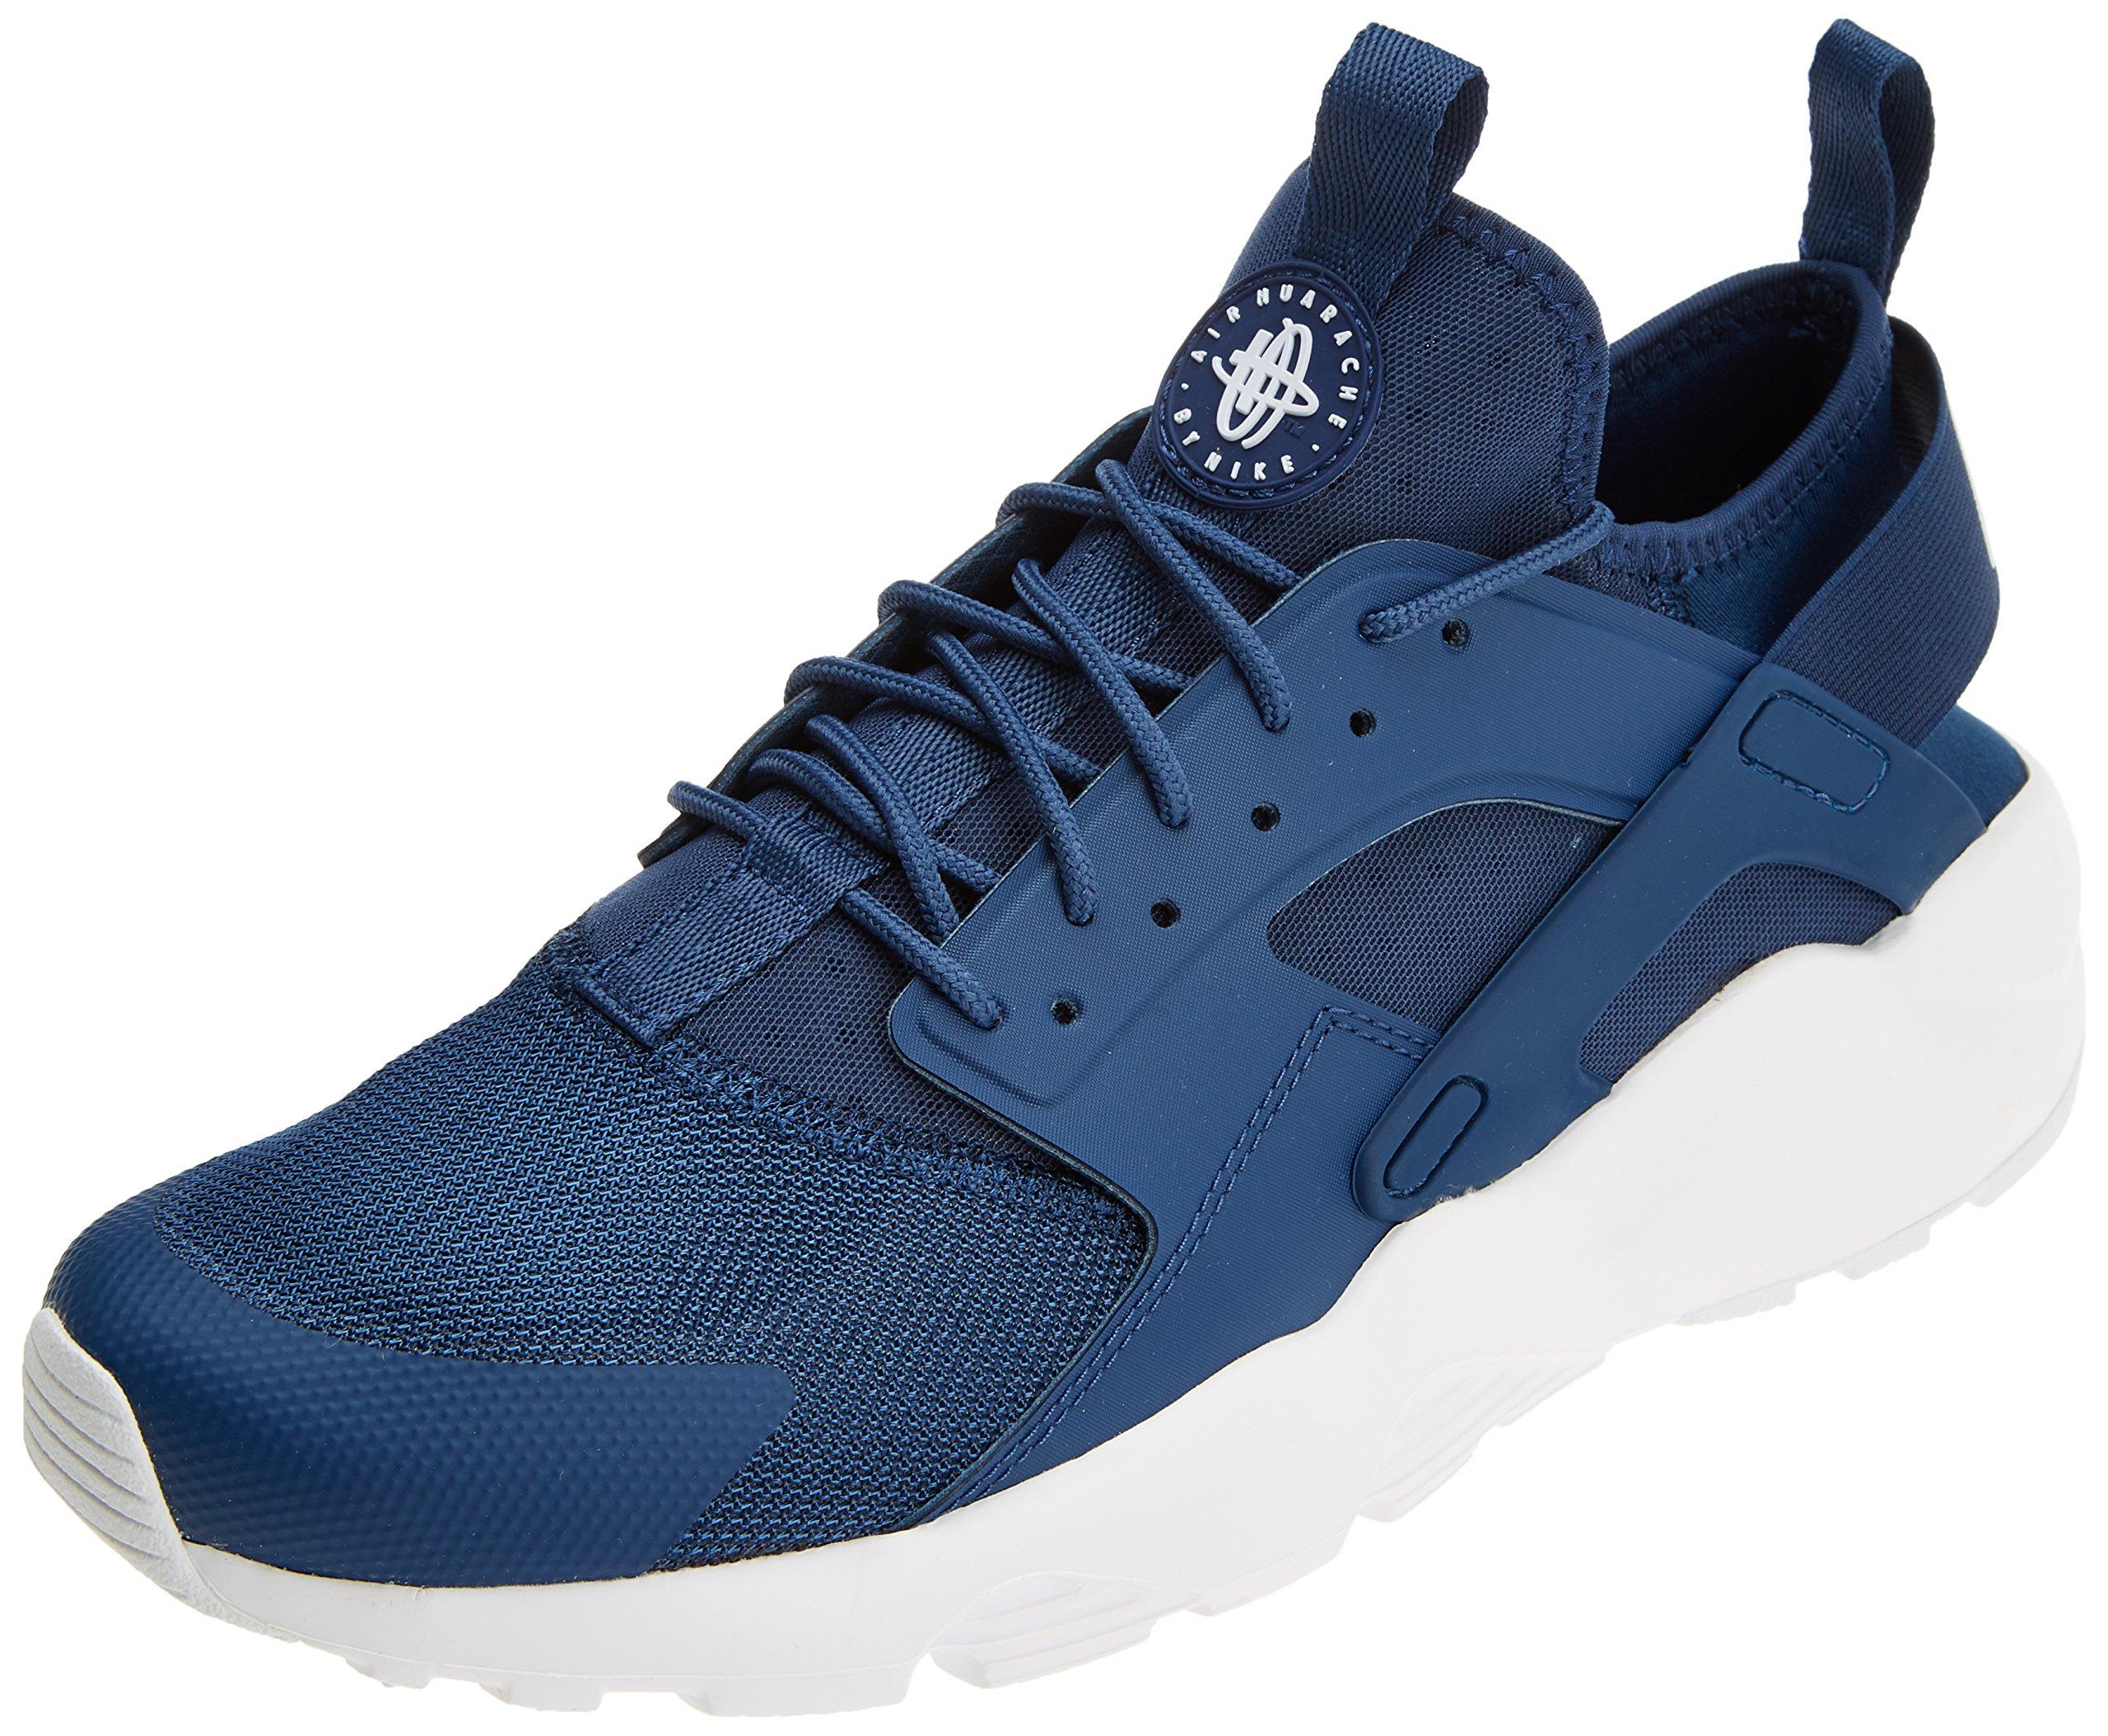 wholesale dealer cd9f5 29dd4 Galleon - Nike Air Huarache Run Ultra Men's Running Shoes Navy/White 819685-409  (8 D(M) US)